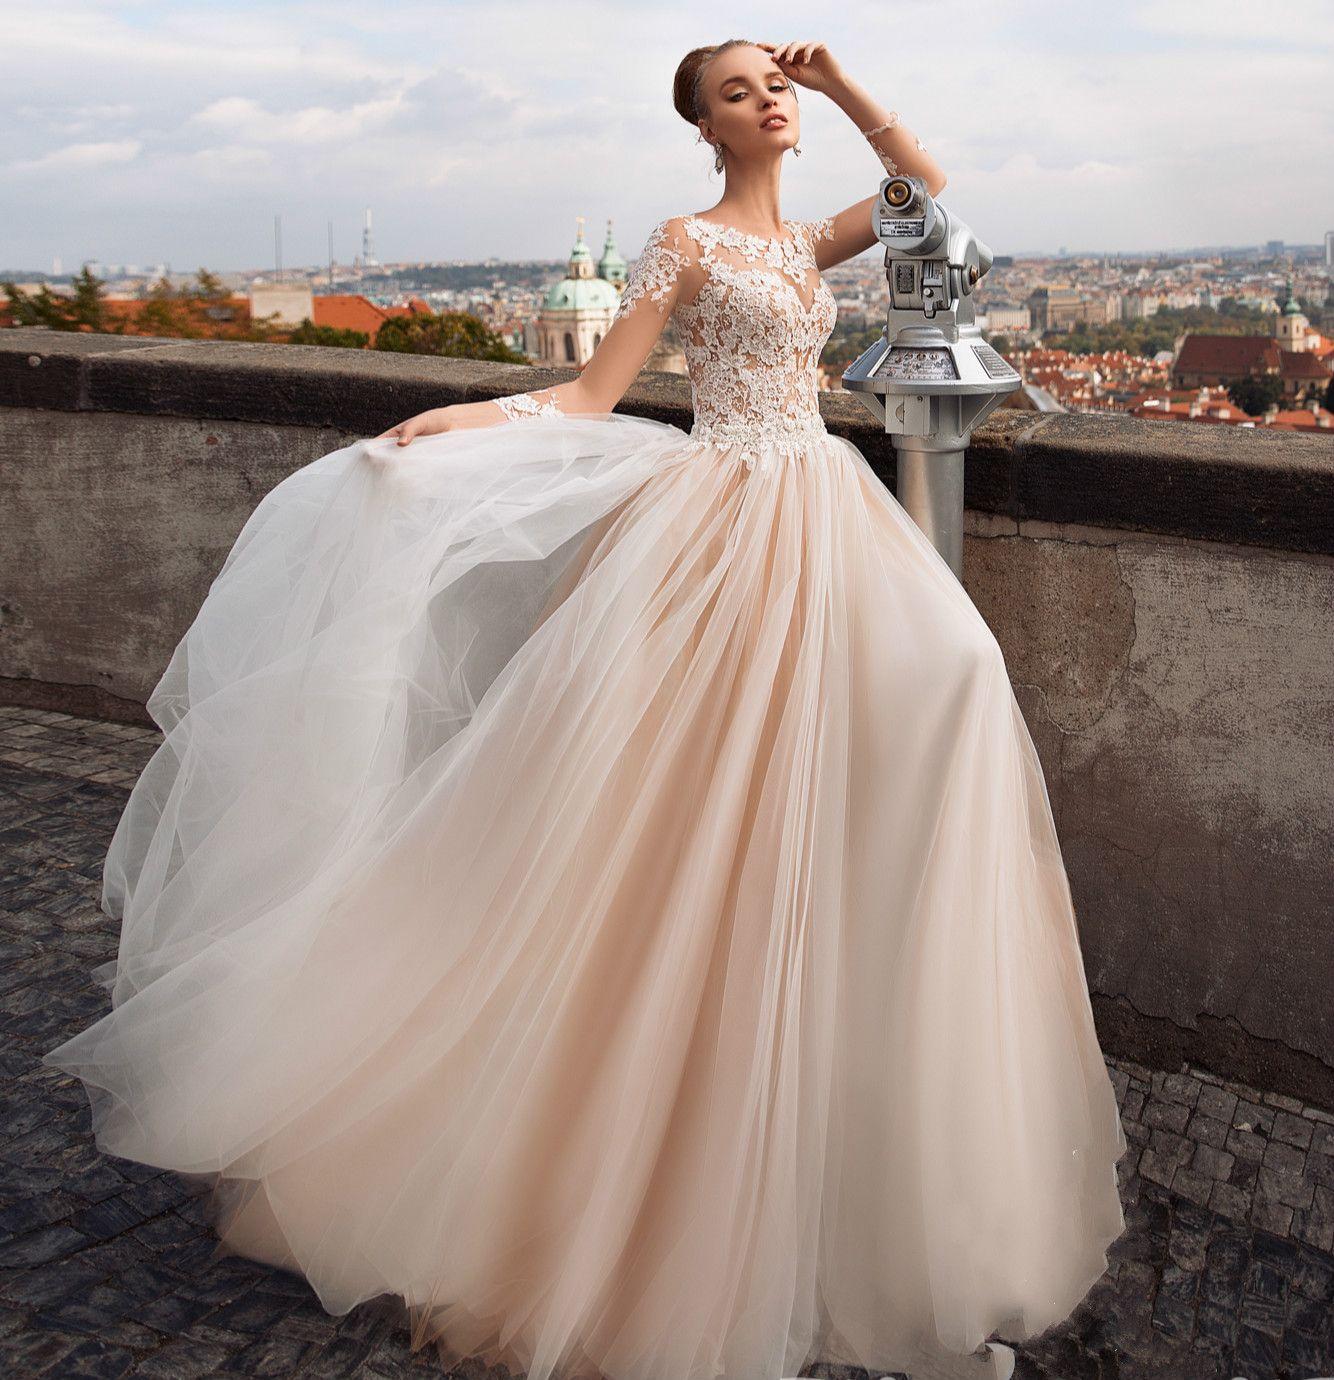 Gorgeous New Design Long Wedding Dress 2020 Jewel Neck Long Sleeves A-Line Chapel Train Appliques Tulle Bridal Gowns Vestidos